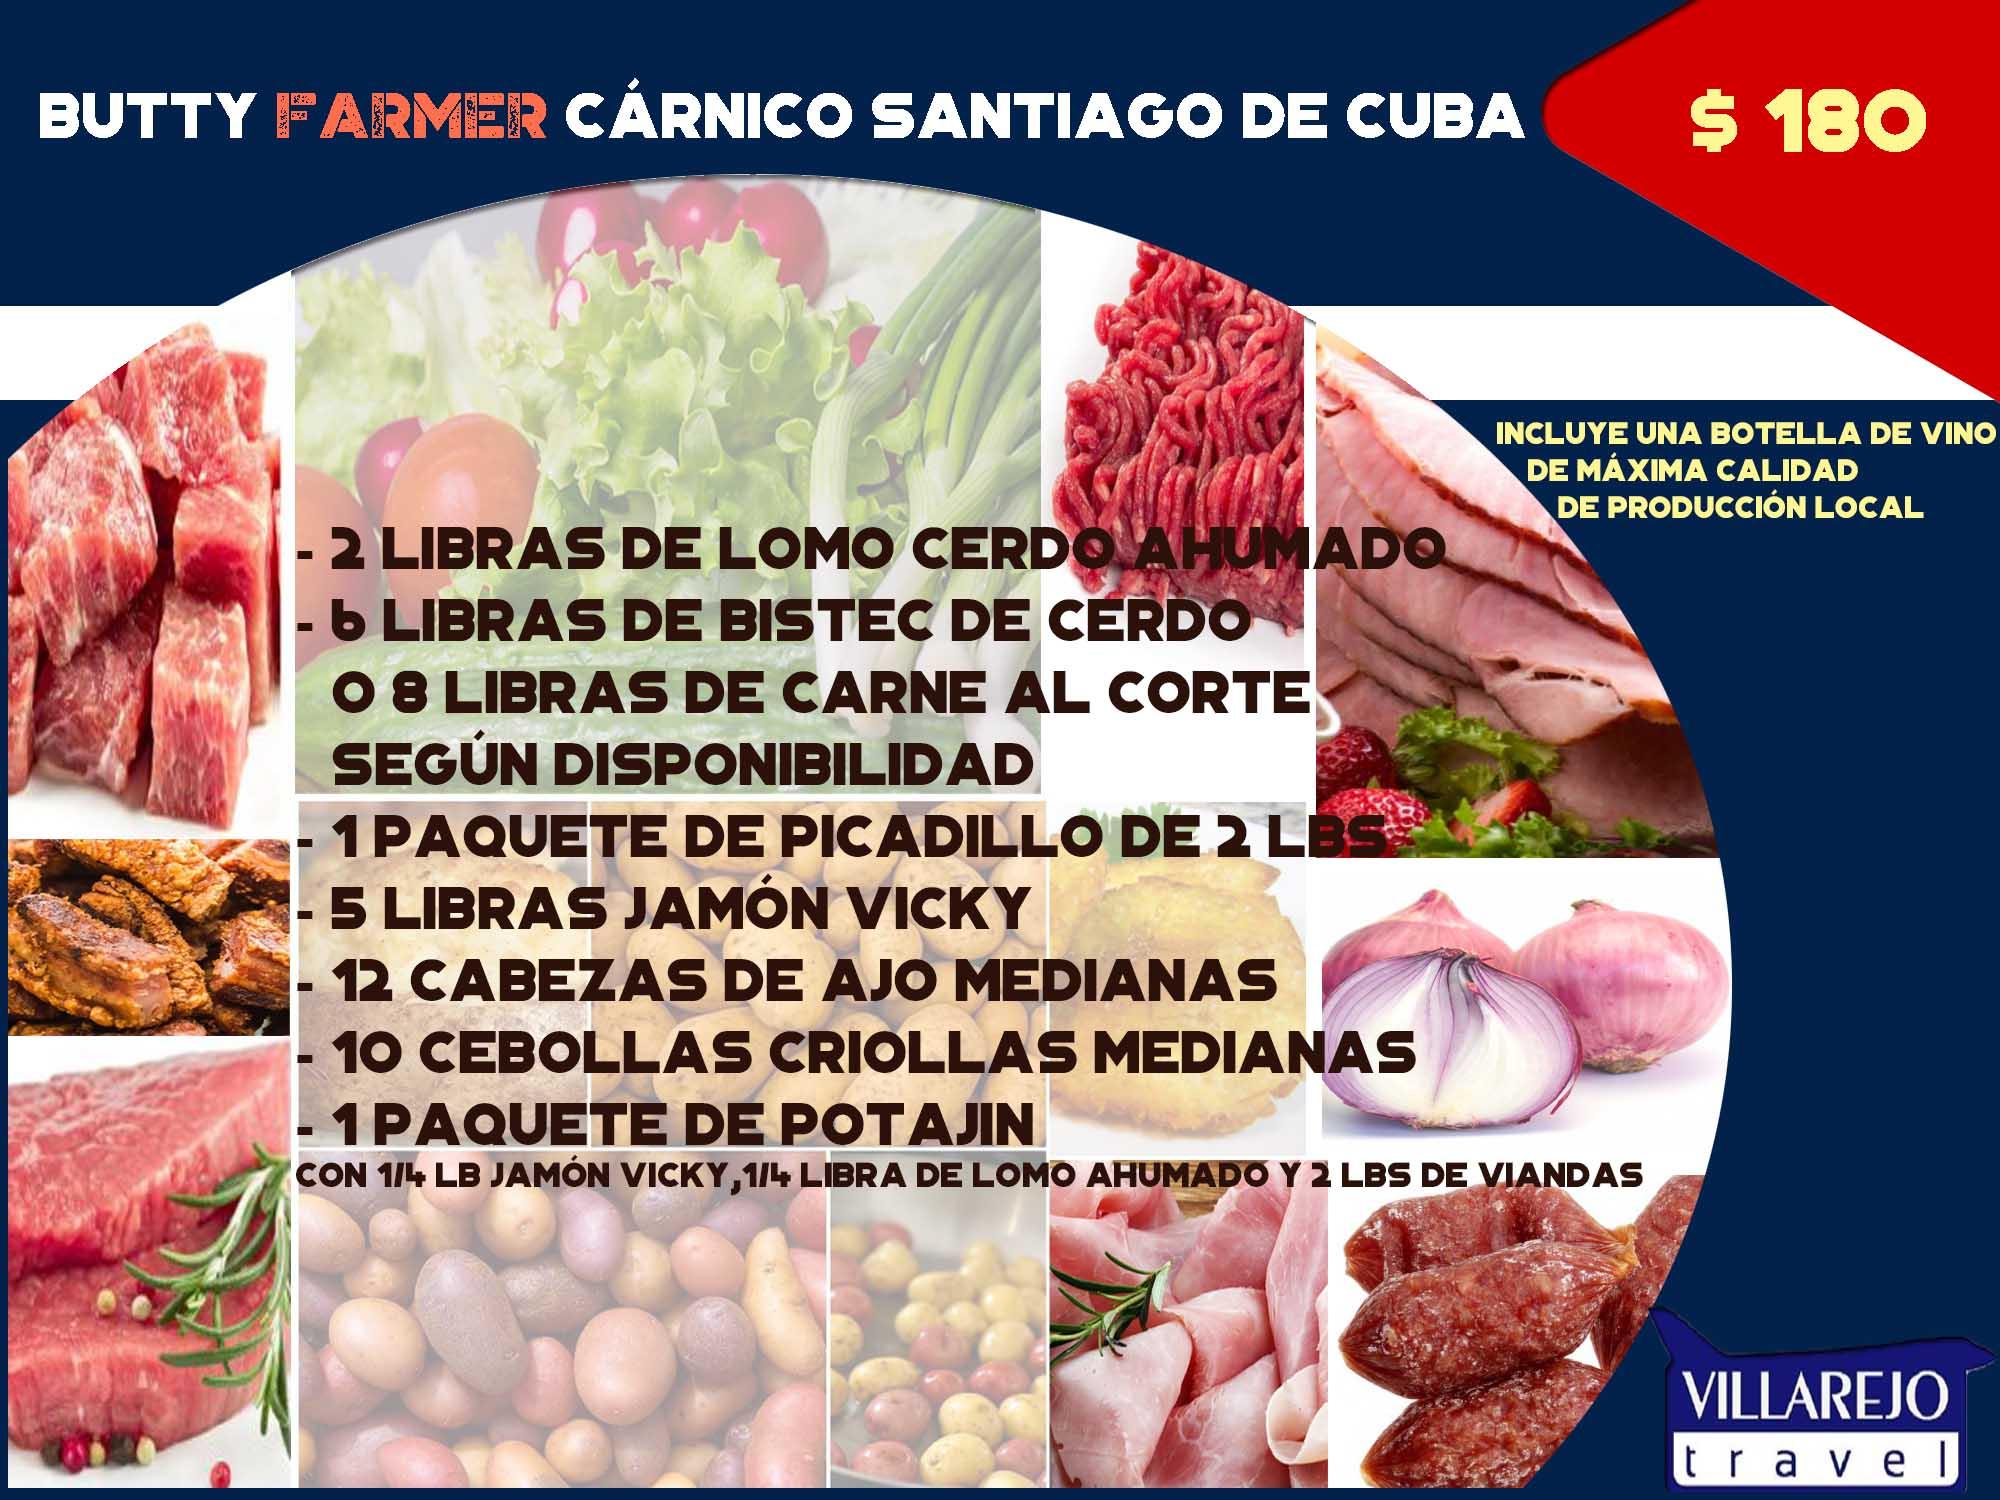 COMBO #2 Butty Farmer Cárnico Santiago de Cuba